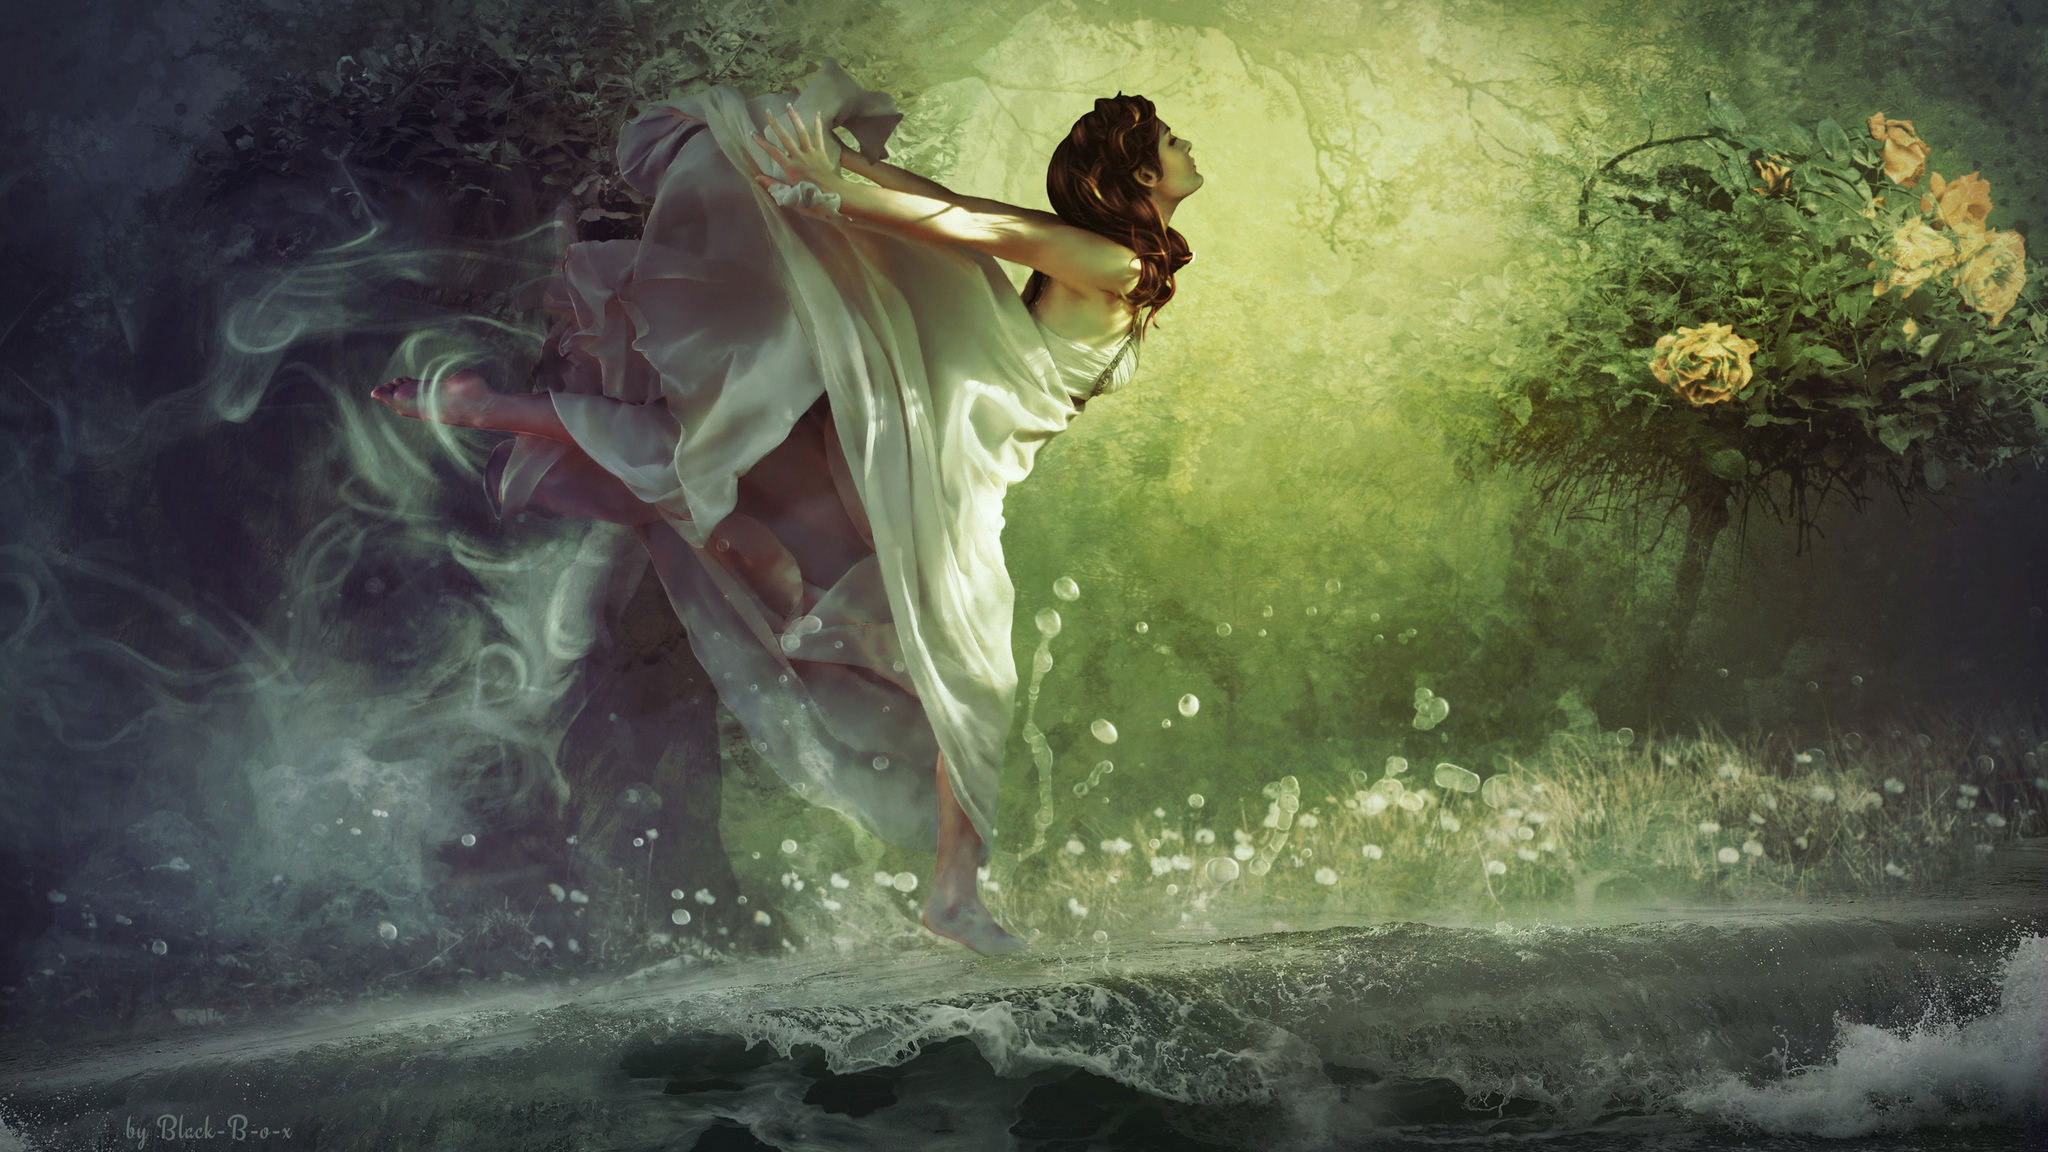 Fantastic Wallpaper Forest Girl - dreamy-forest-girl-fantasy-qu-2048x1152  Gallery_248540 .jpg